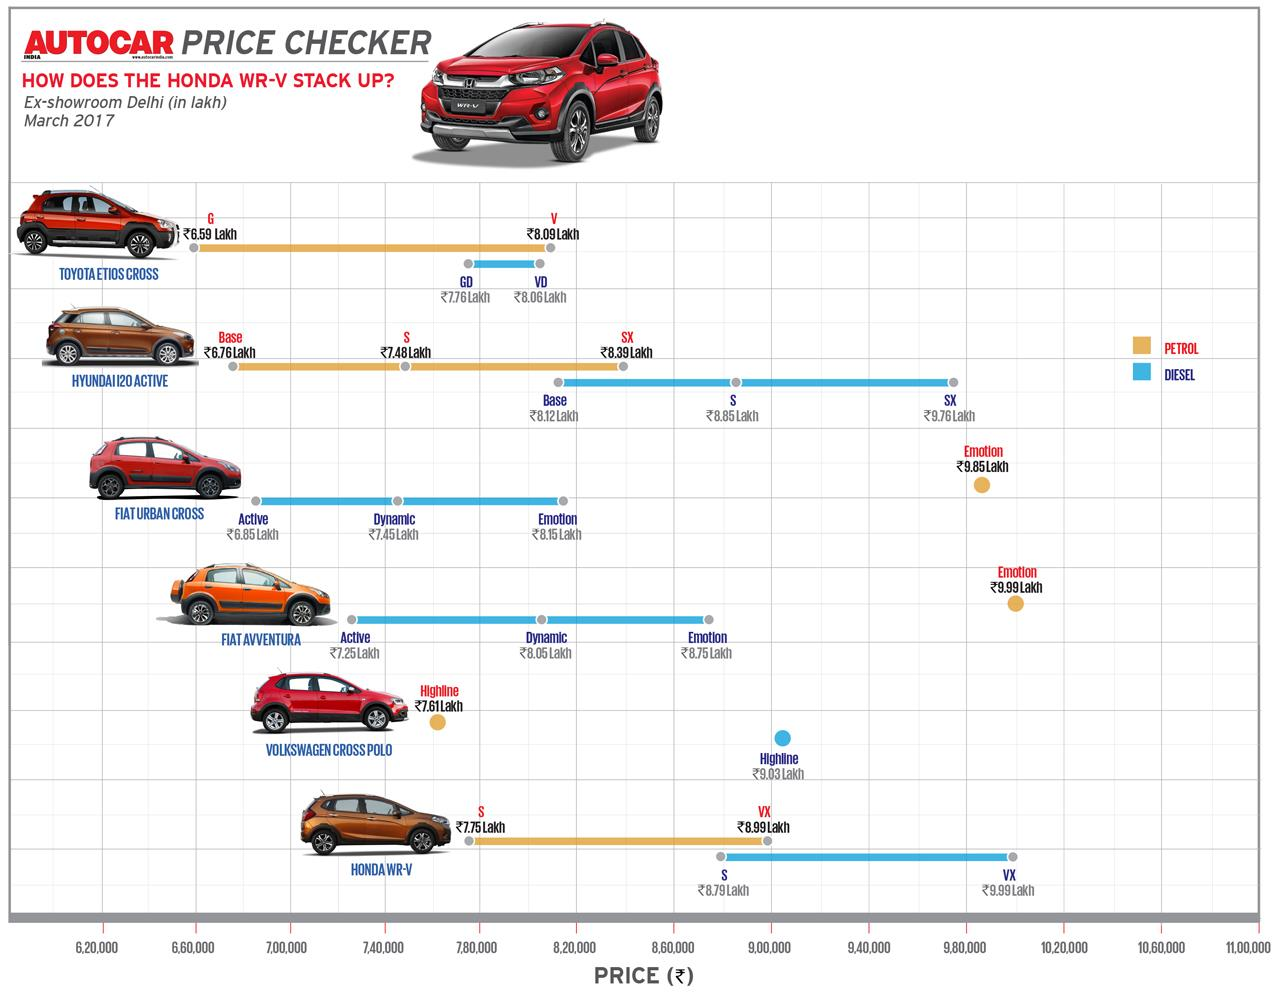 Autocar Price Checker: How does the Honda WR-V stack up